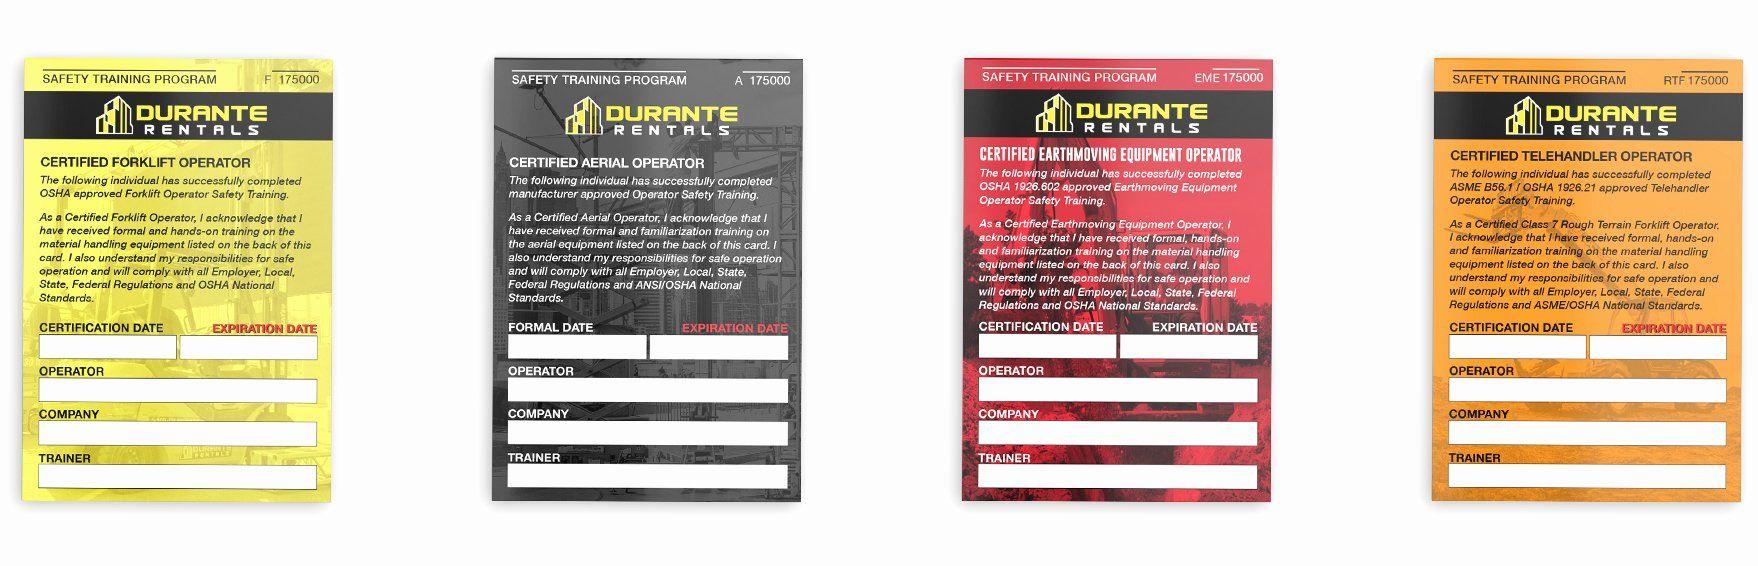 Equipment Operator Certification Card Template Elegant Construction Equipment Training Card Template Card Templates Printable Templates Wallet size certification card template